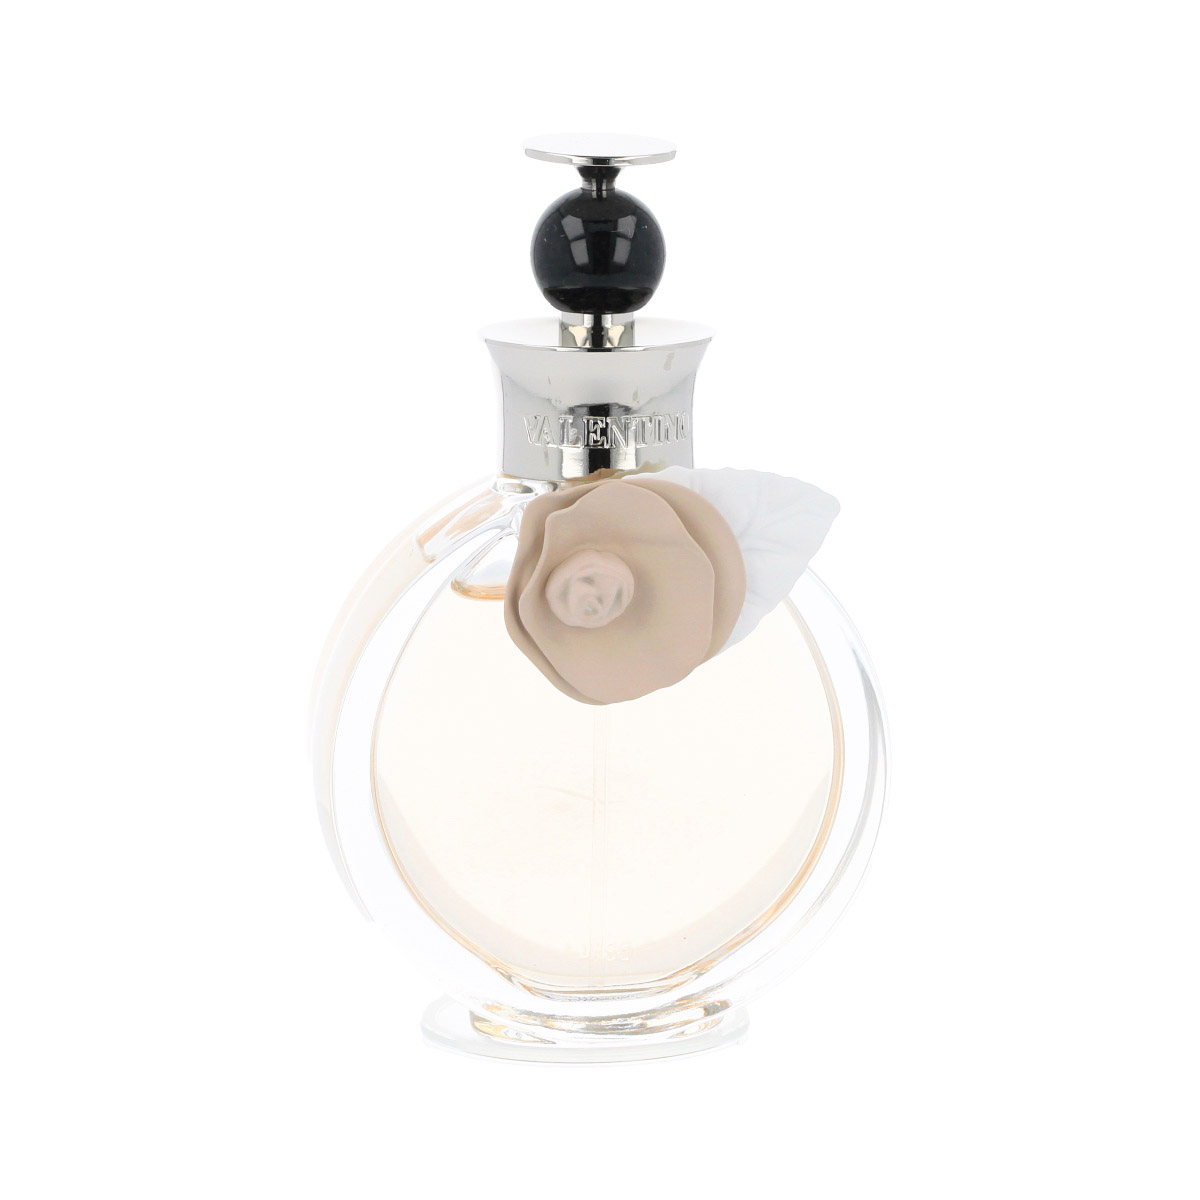 Valentino Valentina Eau De Parfum 30 ml (woman) 65549